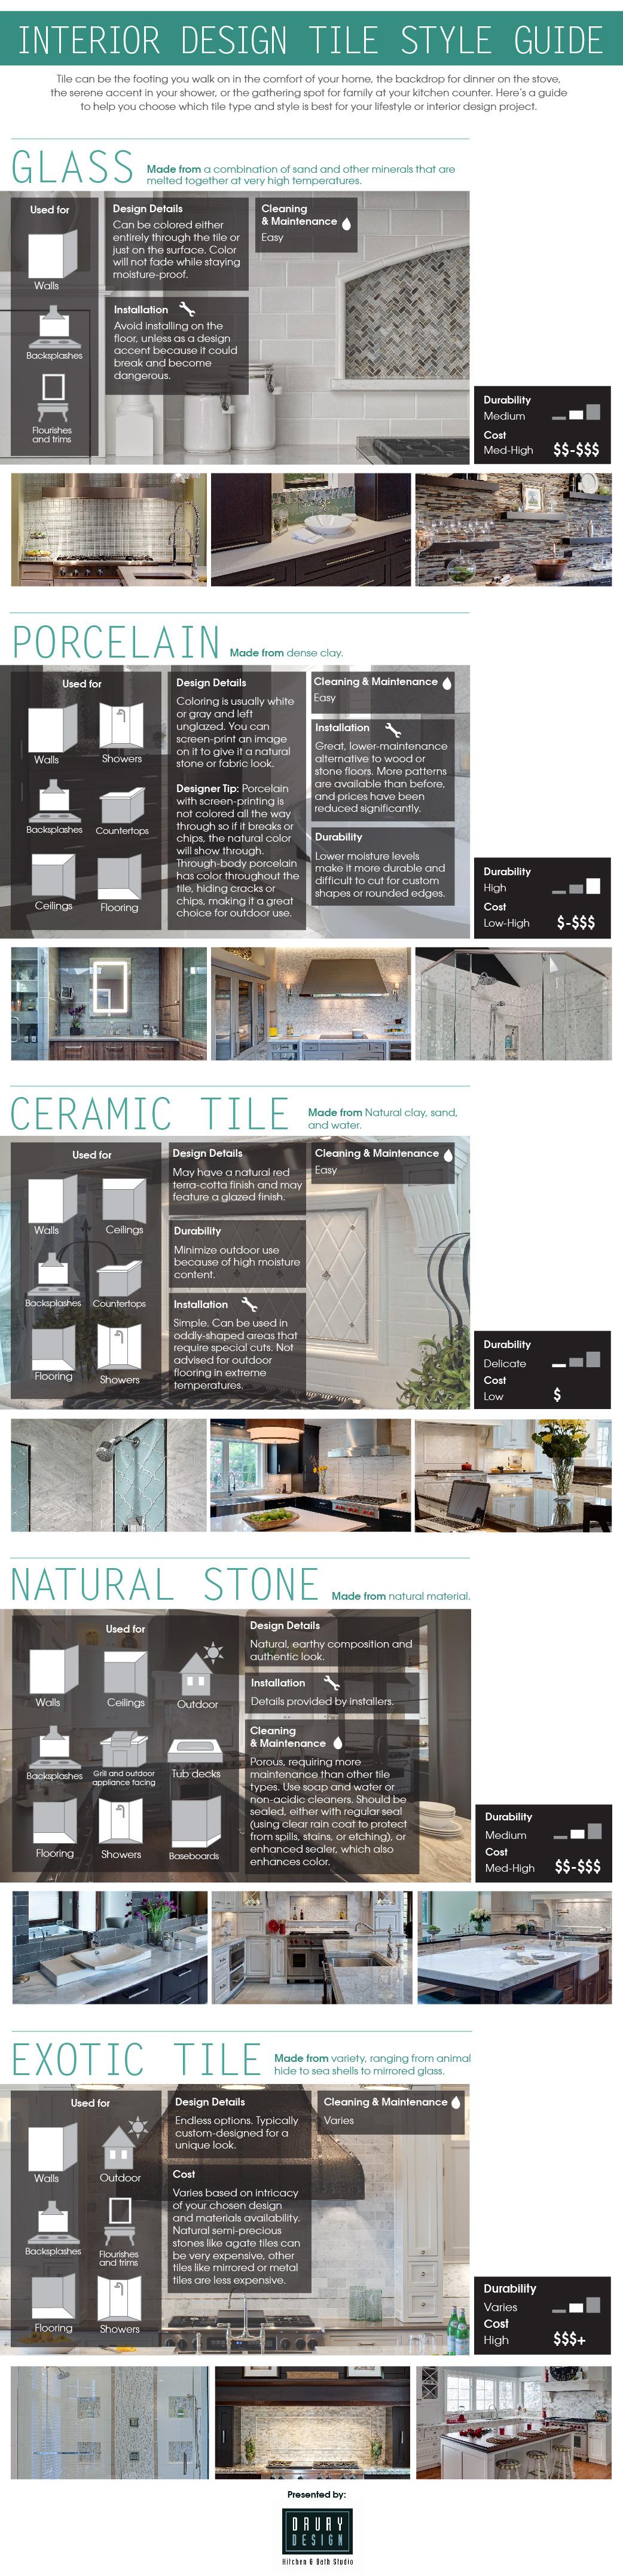 Tile_Guide_for_Interior_Design_-_Drury_Design